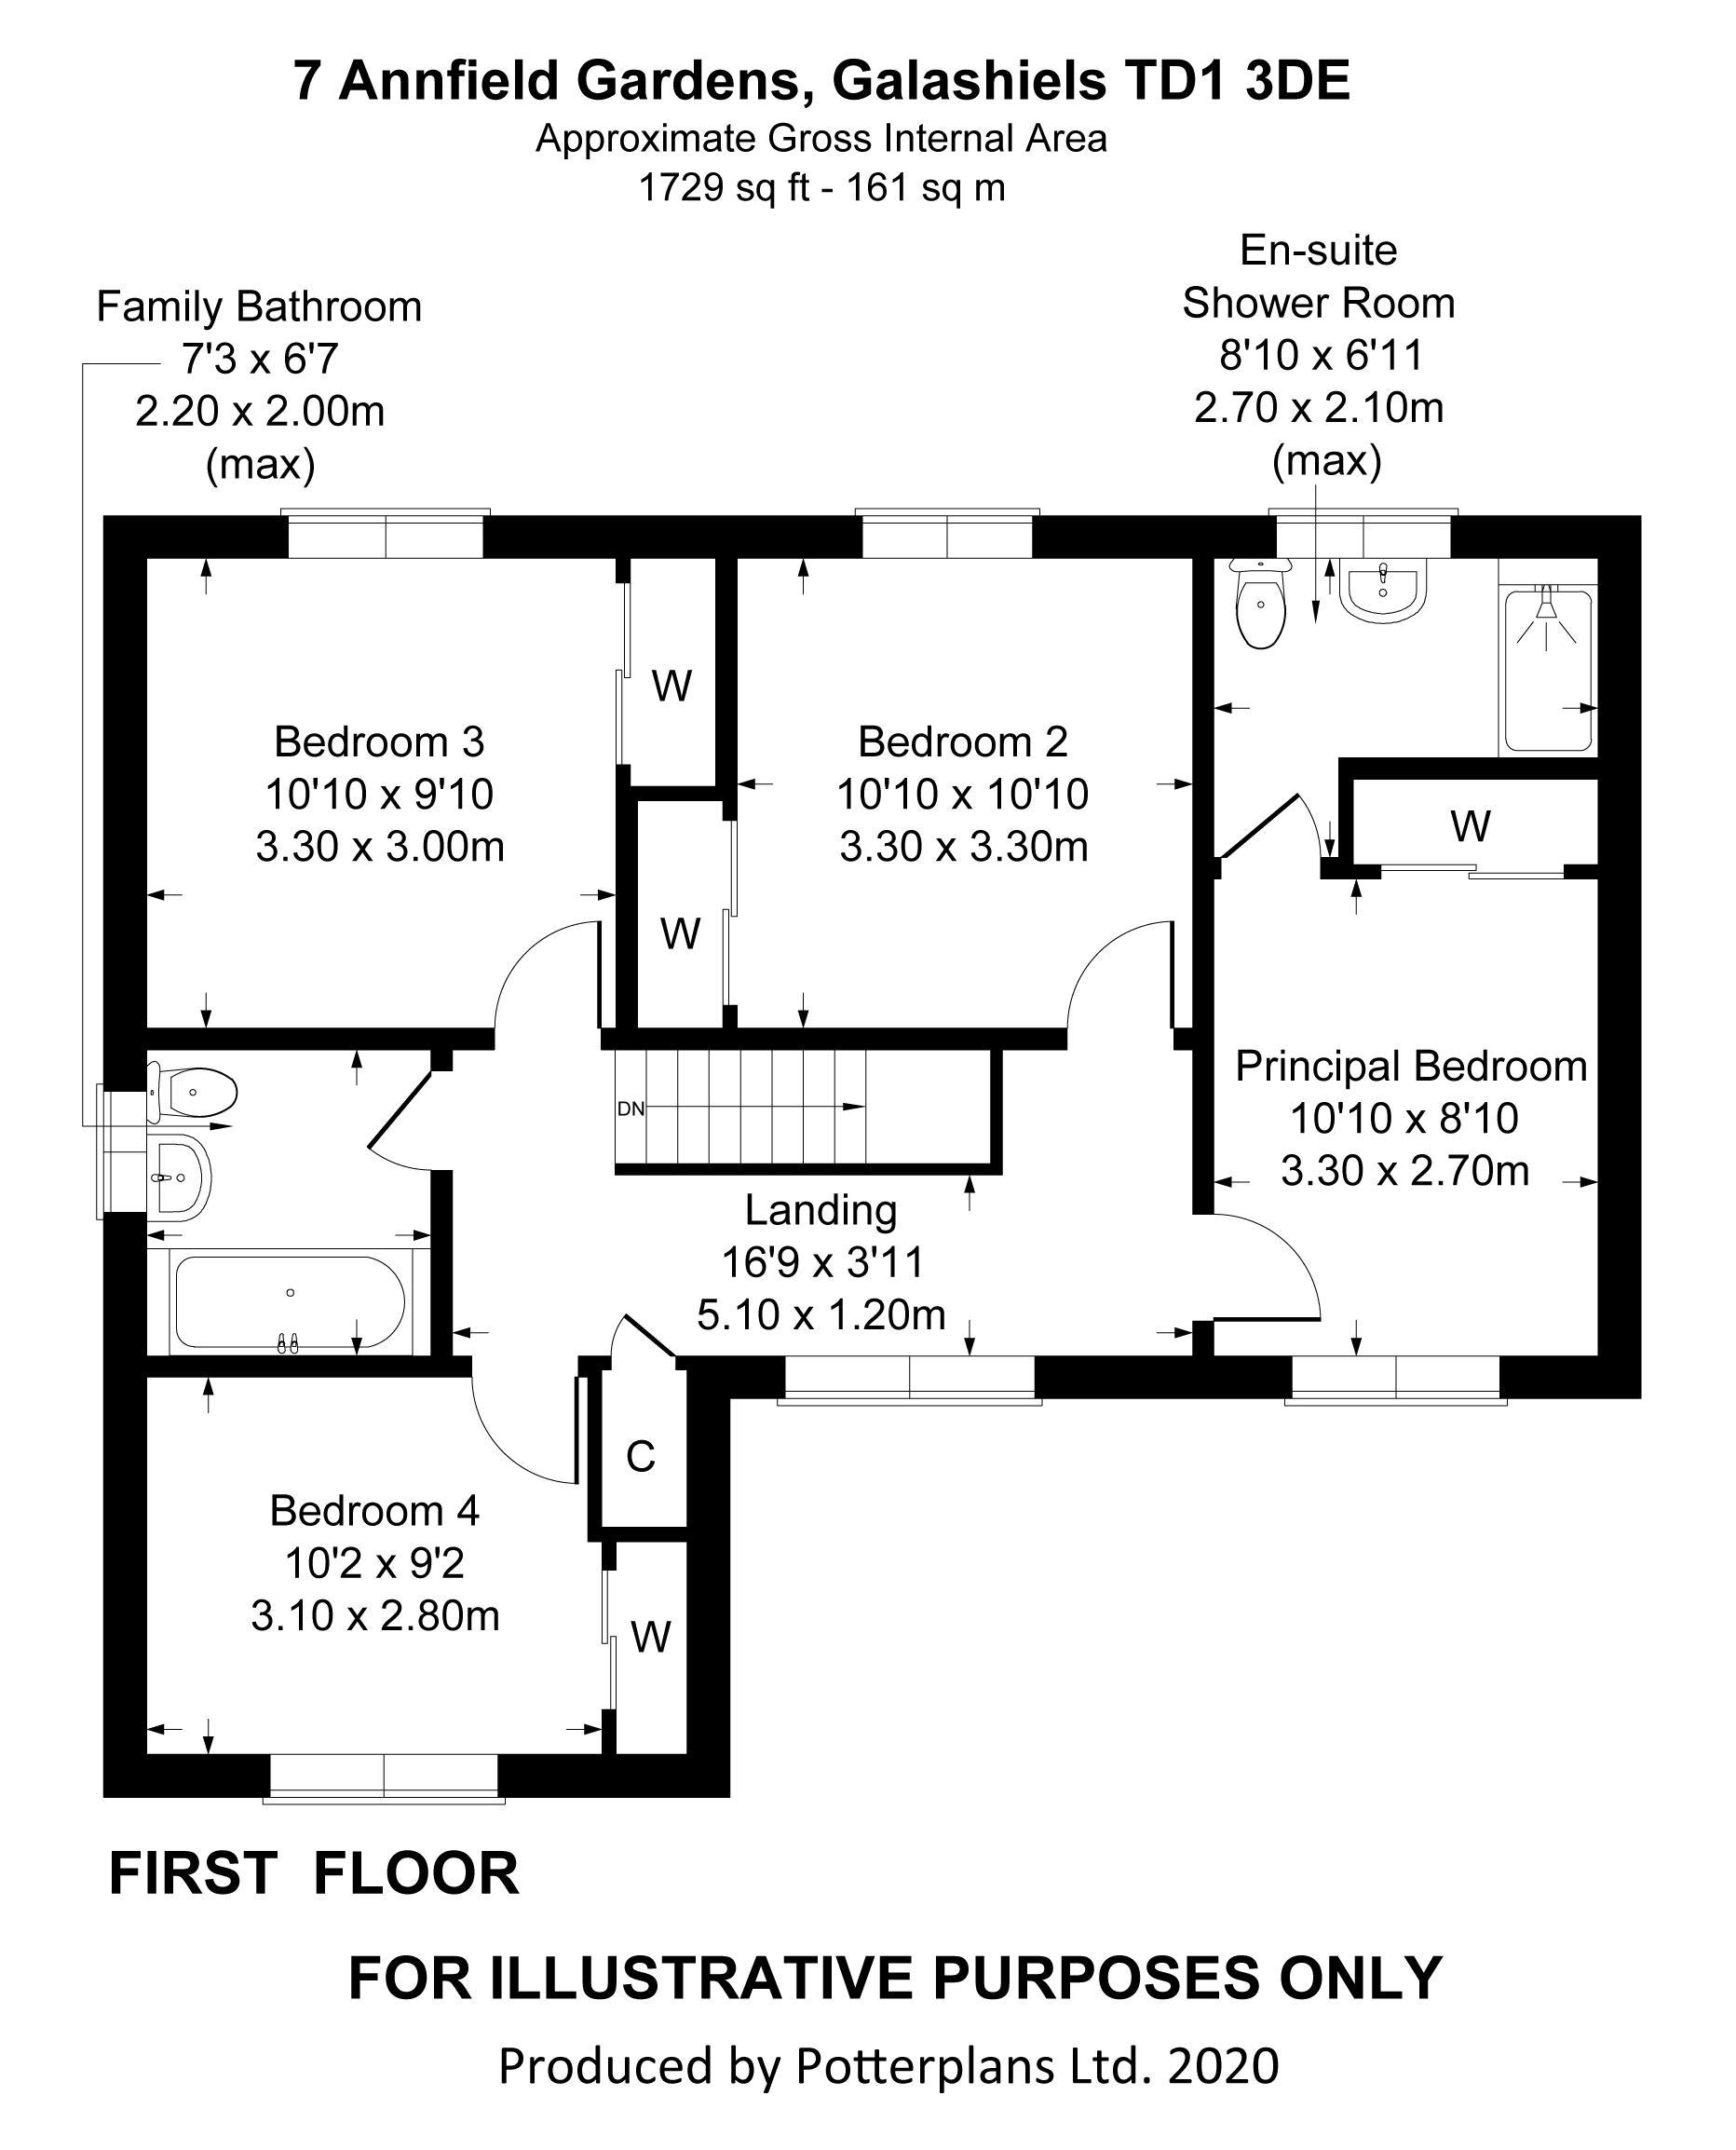 7 Annfield Gardens First Floor